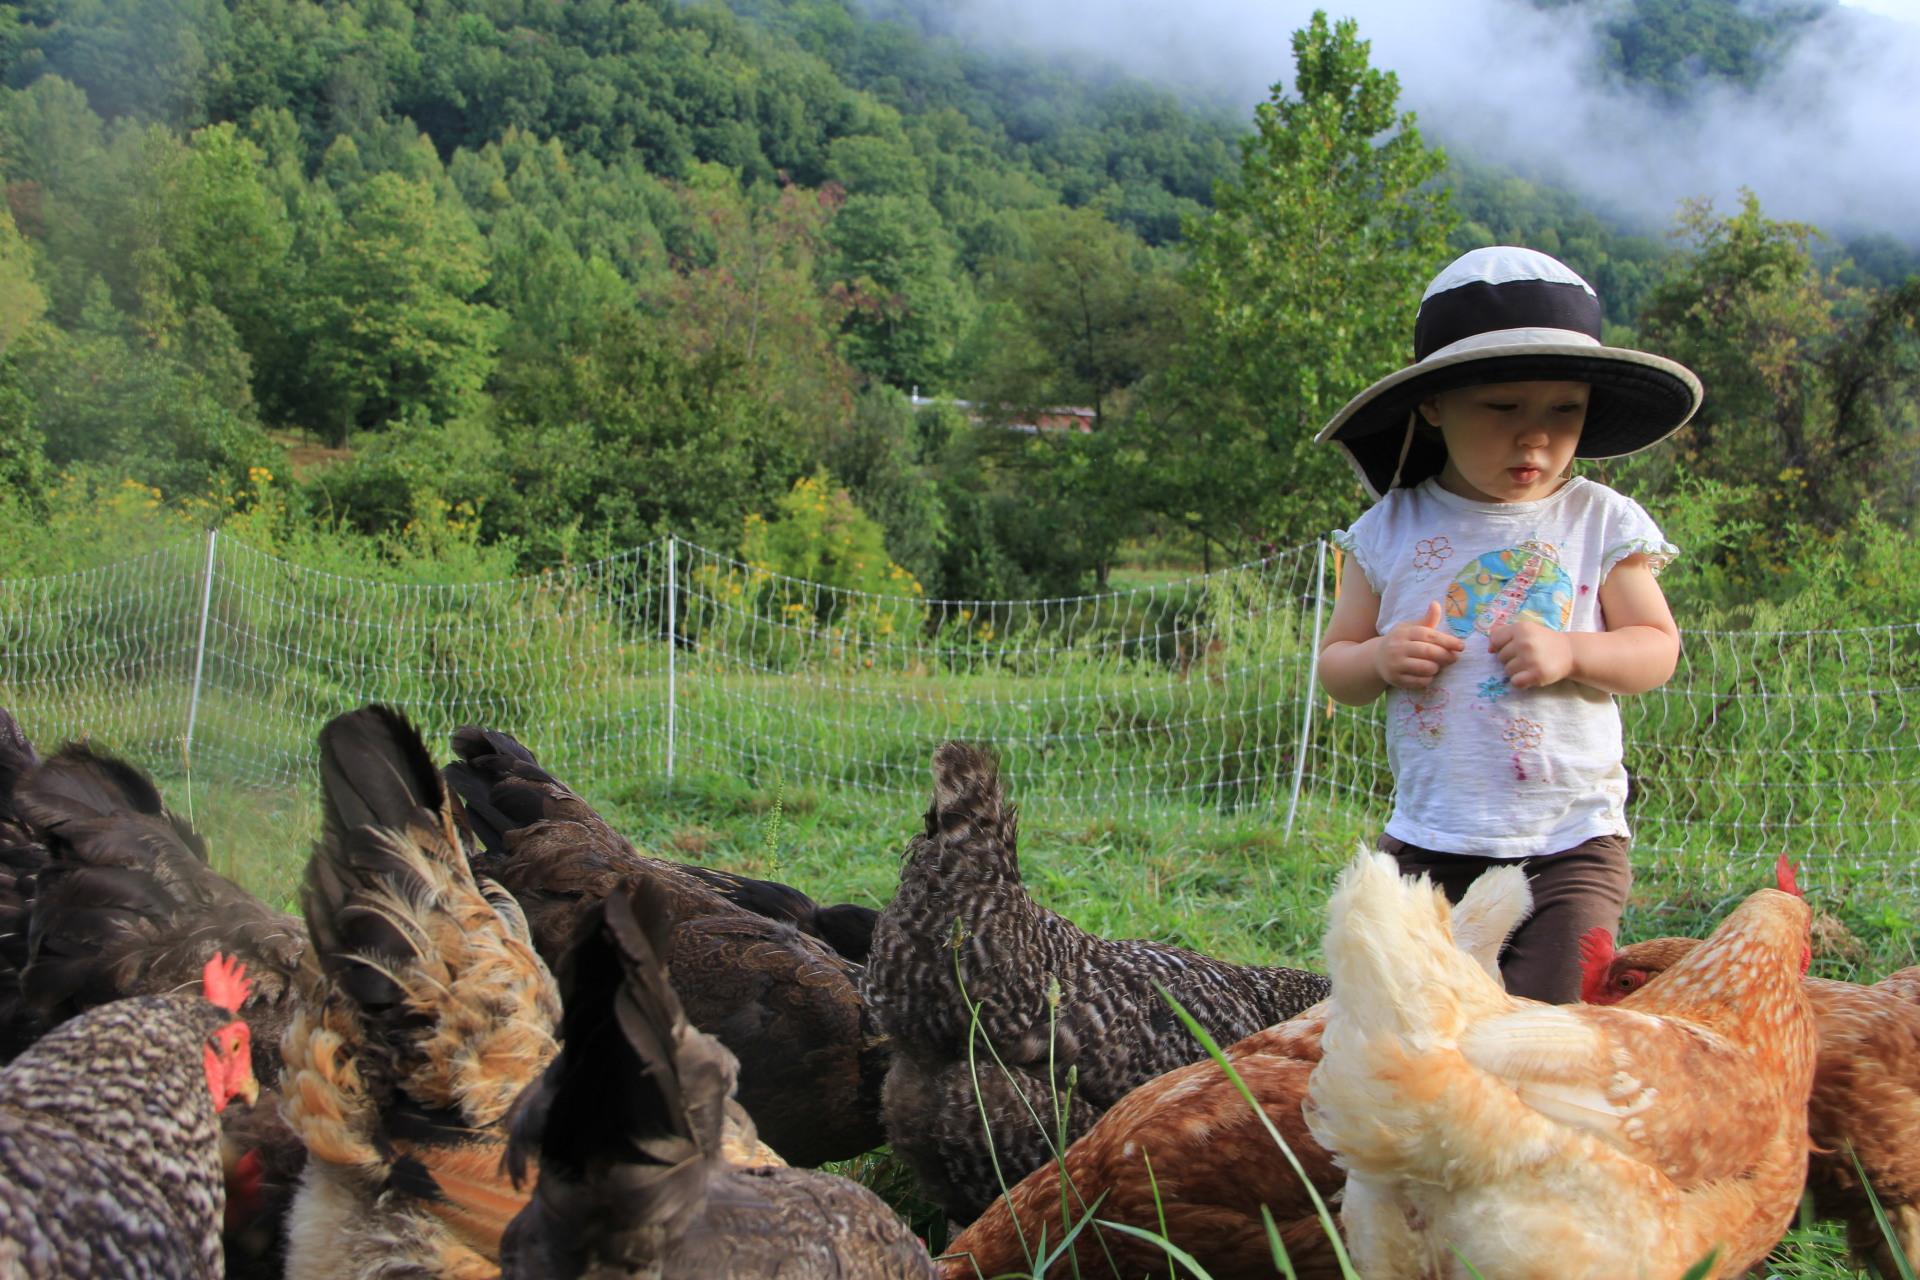 Leah Littman feeding the chickens